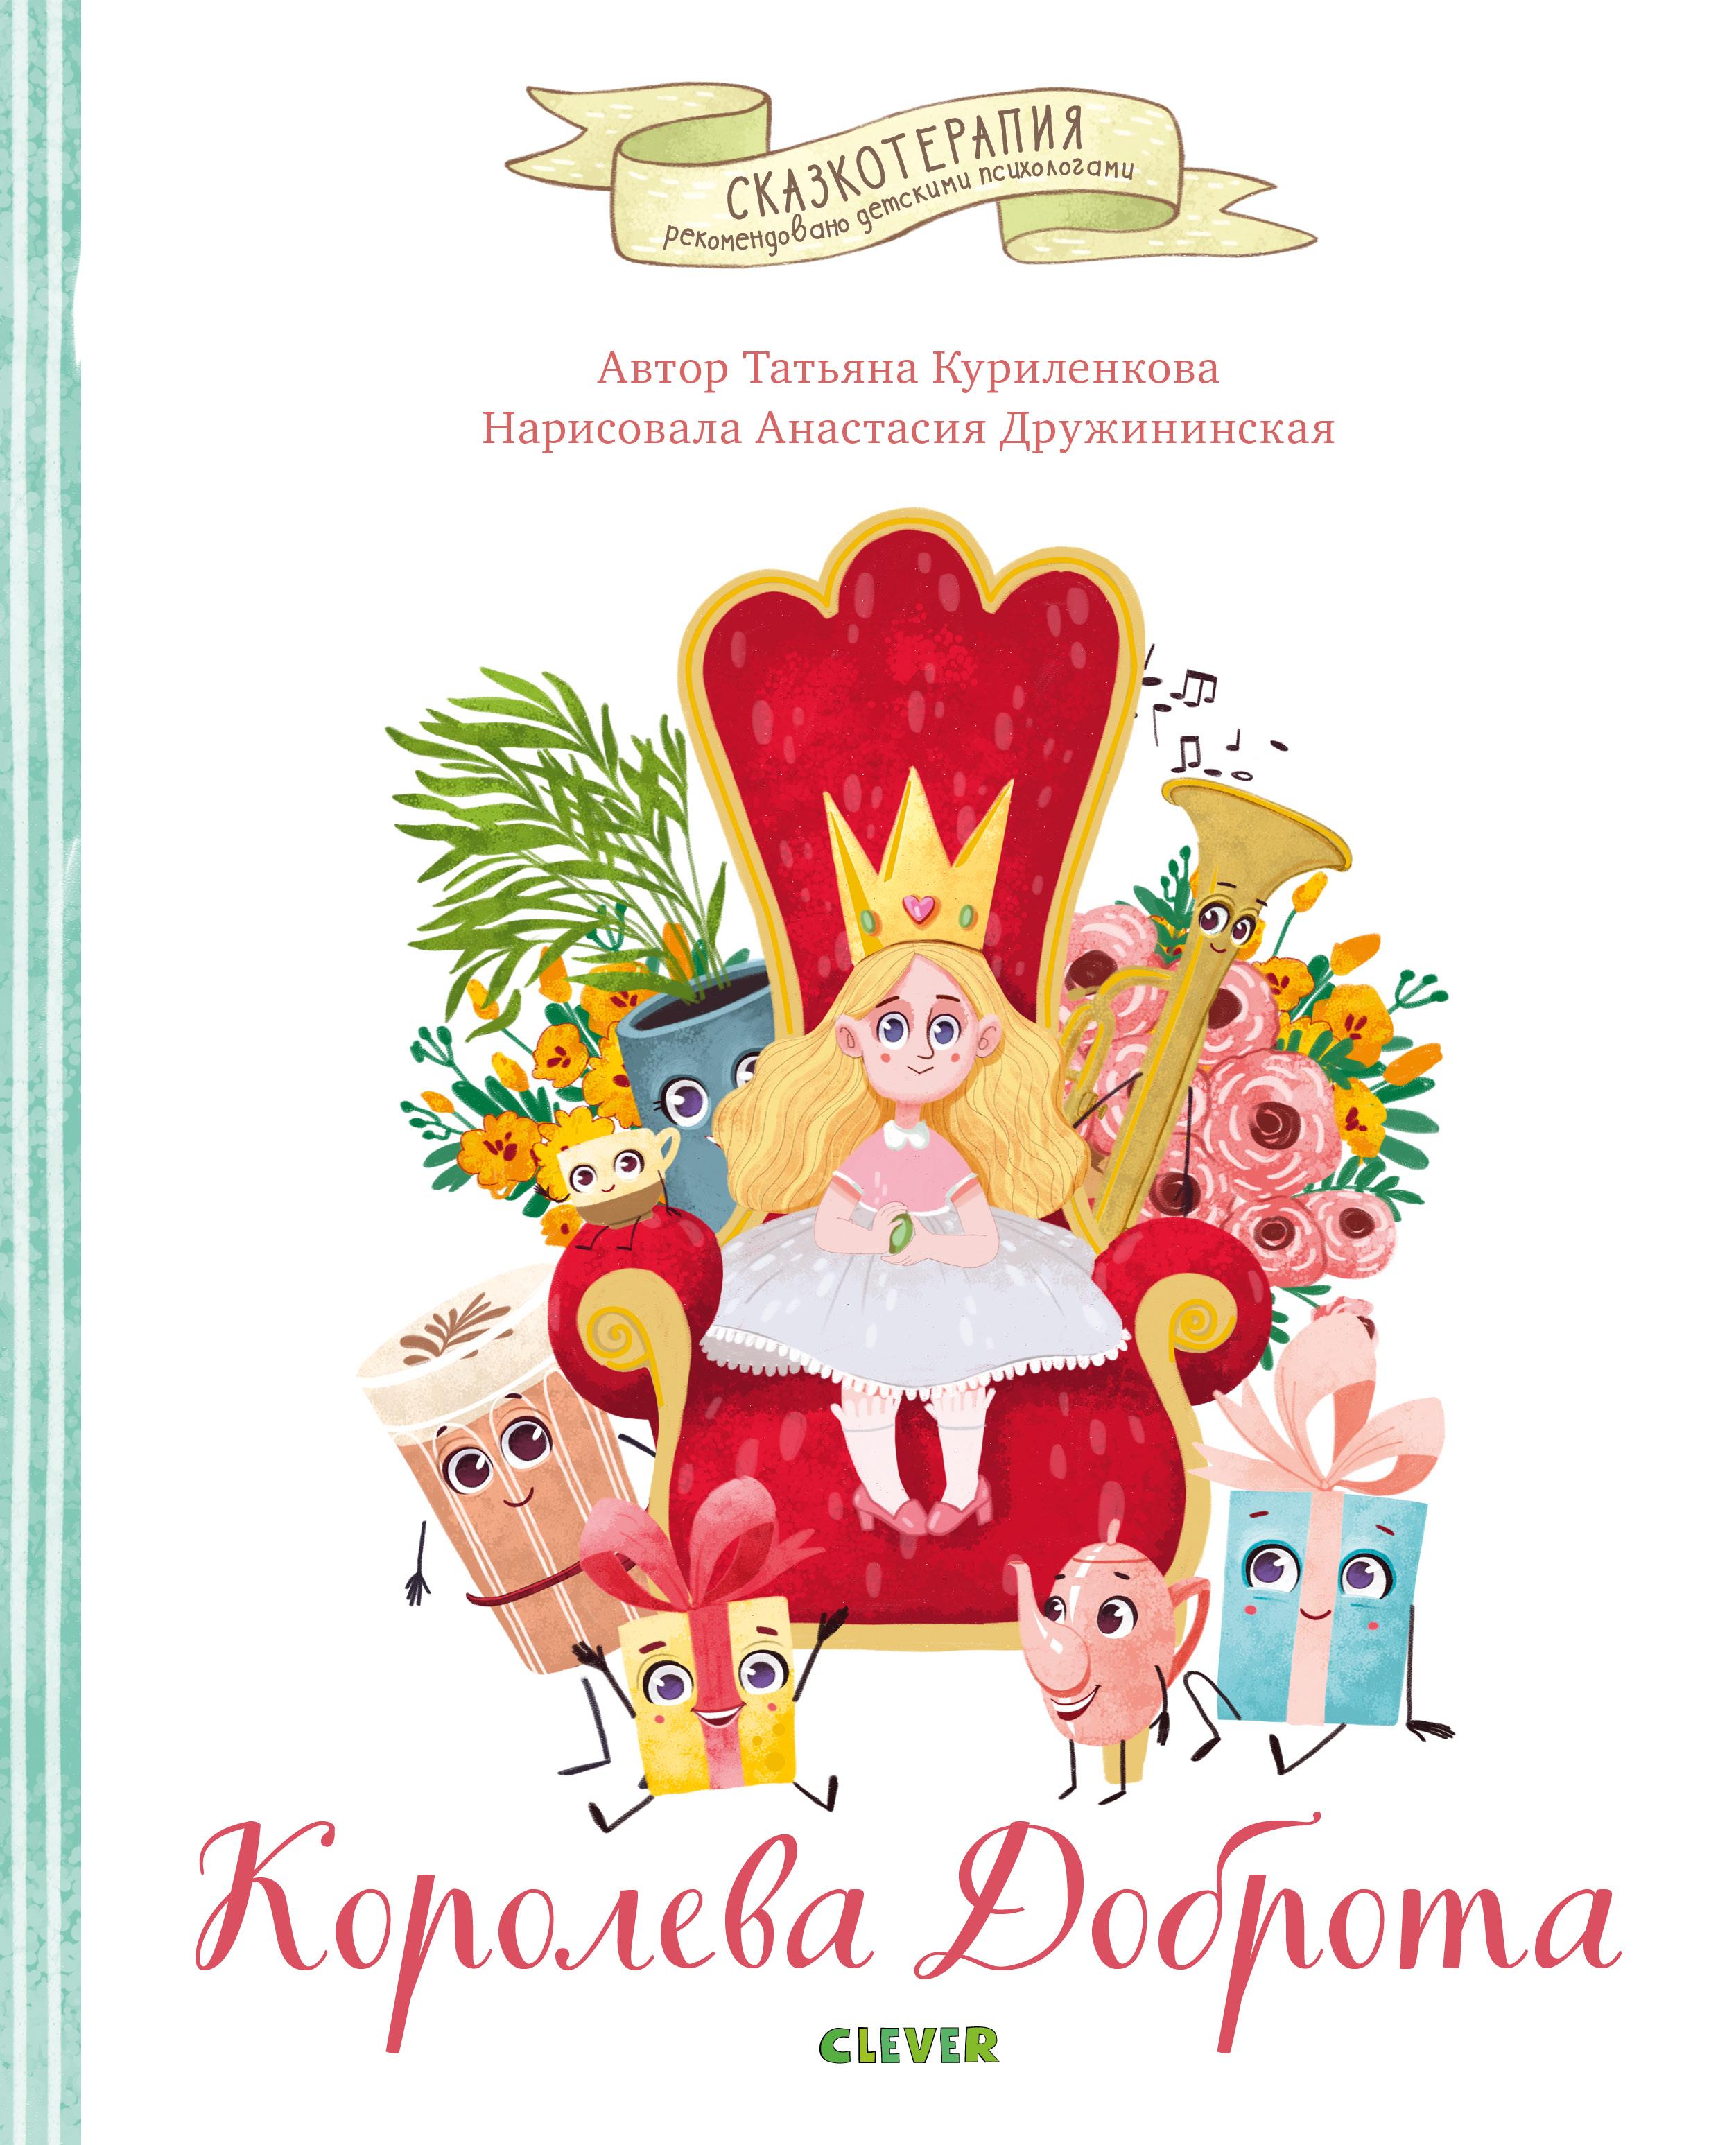 Татьяна Куриленкова Сказкотерапия. Королева Доброта